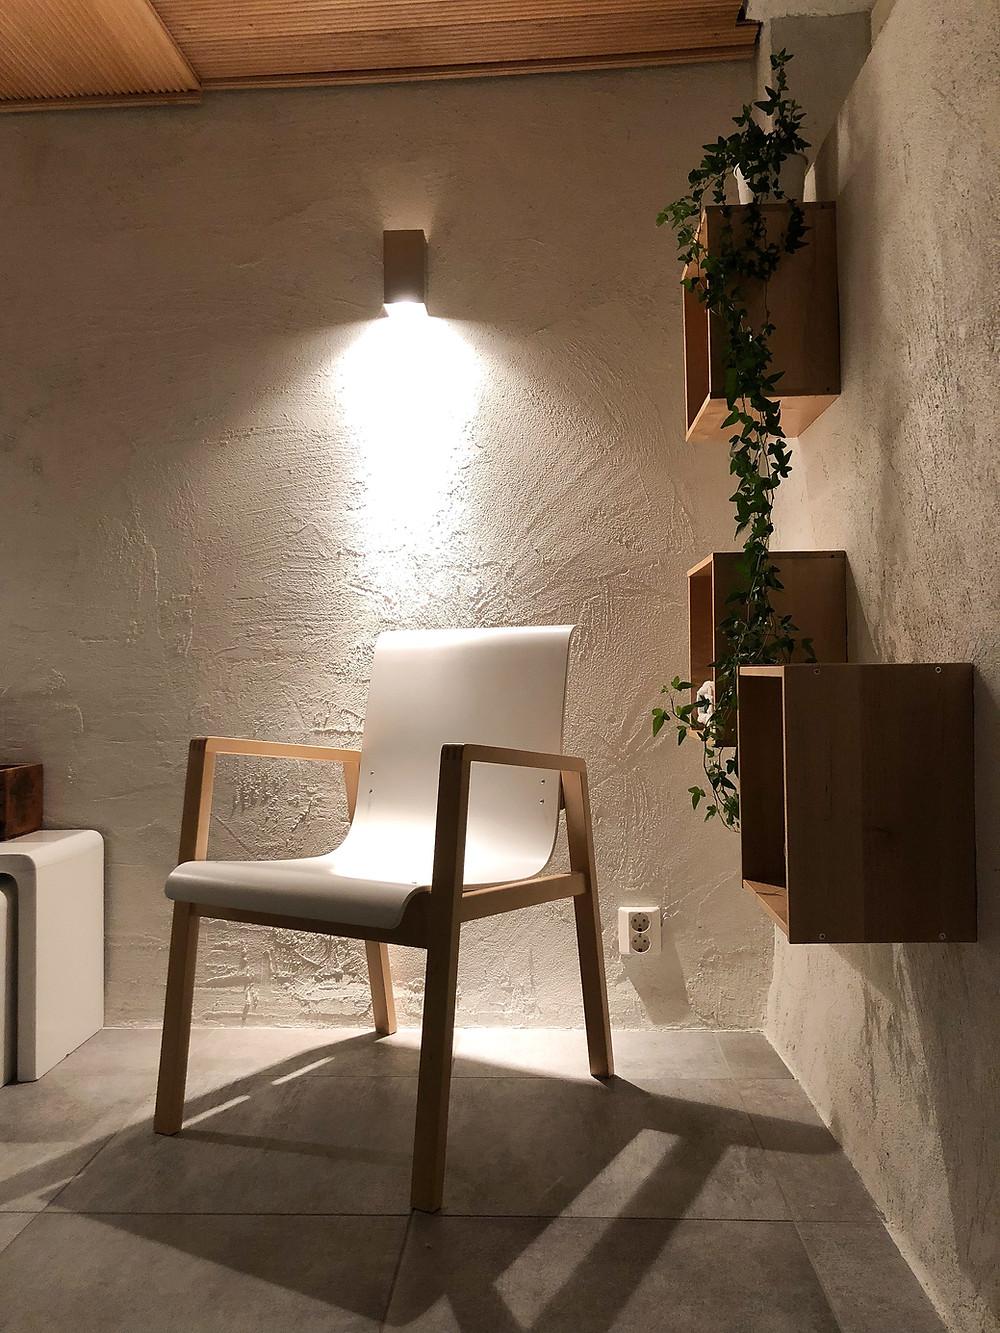 sormipaneelikatto, artek 403 -tuoli, takkahuone, finger panel,